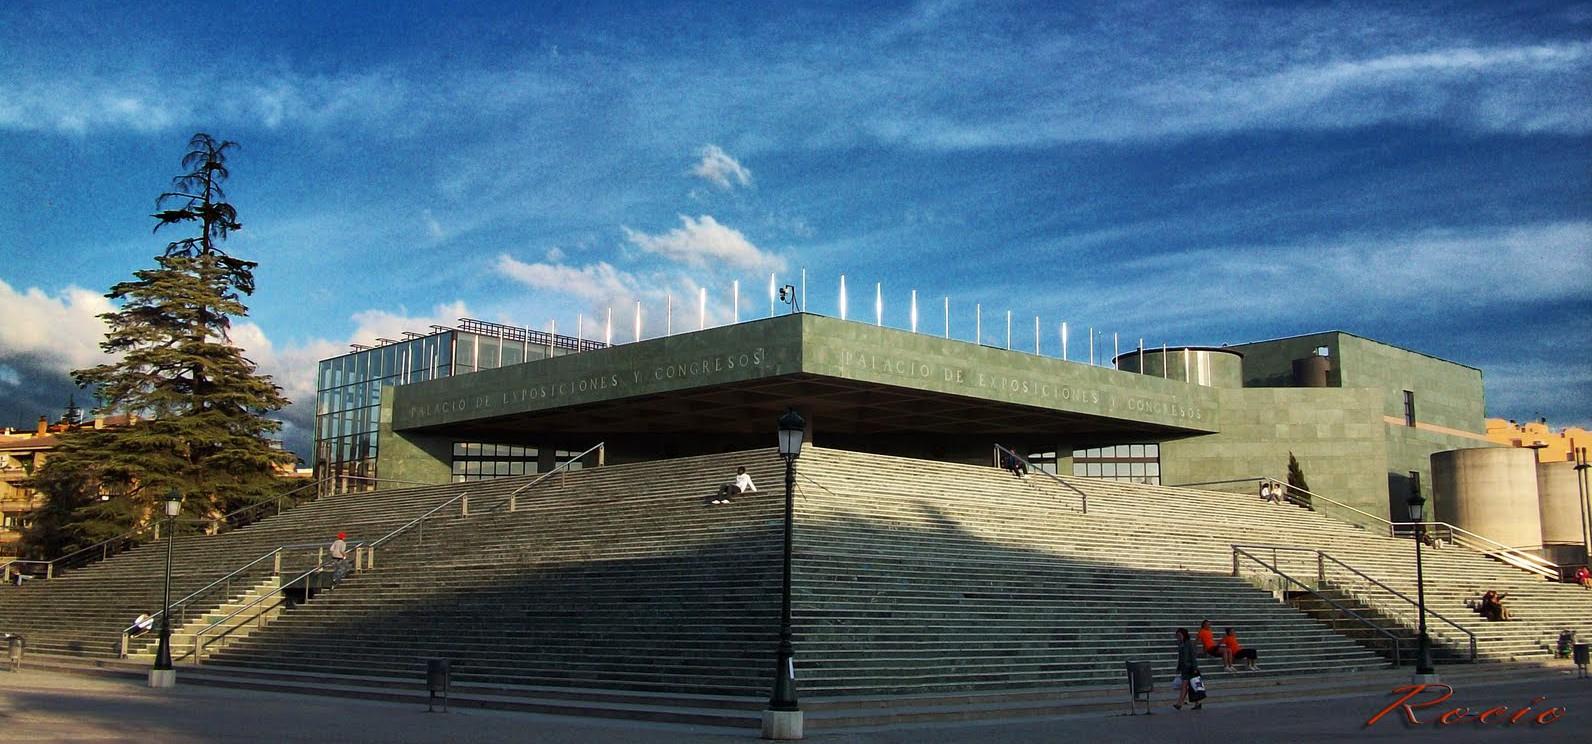 palacio+de+congresos